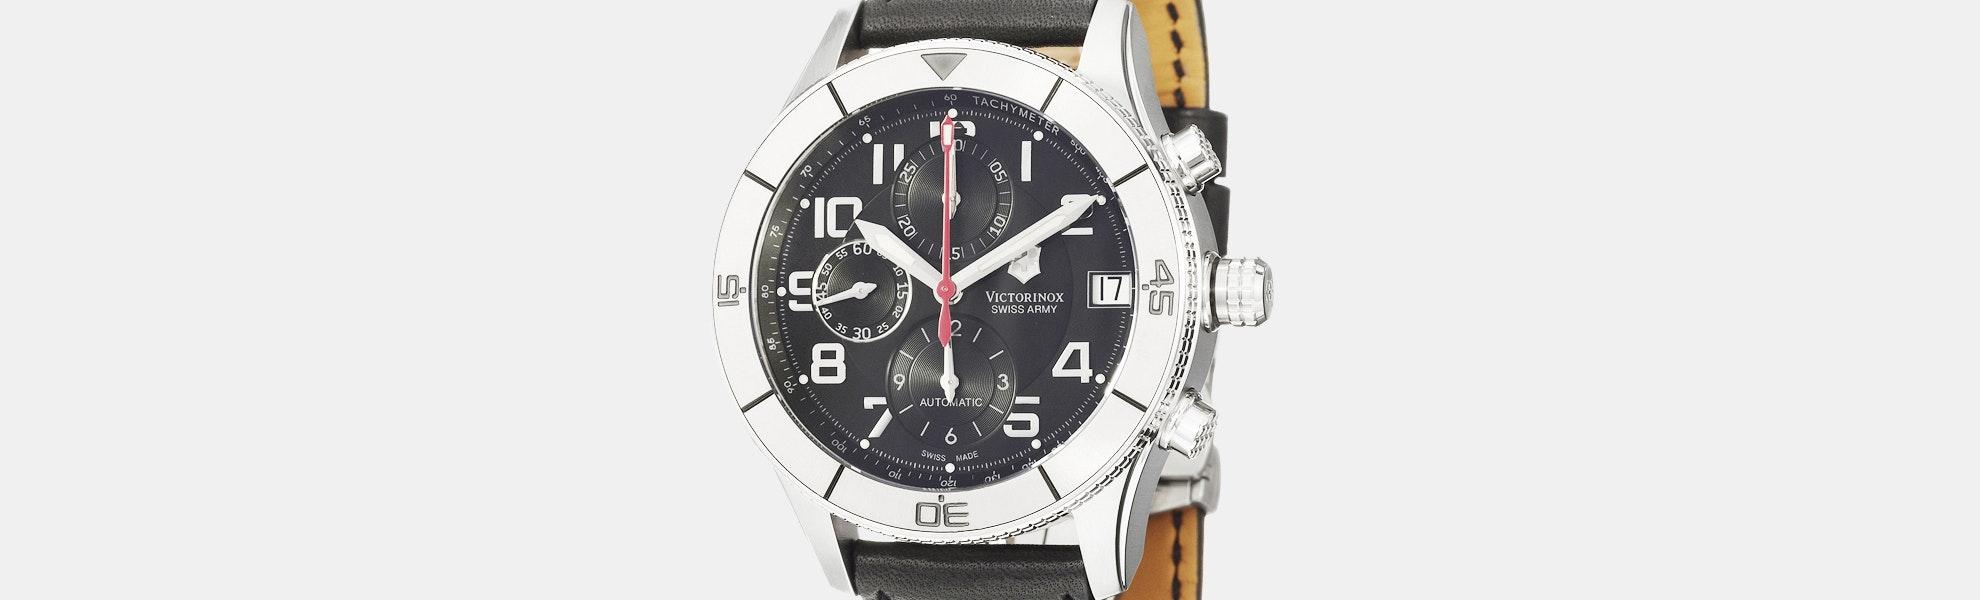 Victorinox Ambassador Automatic Chronograph Watch